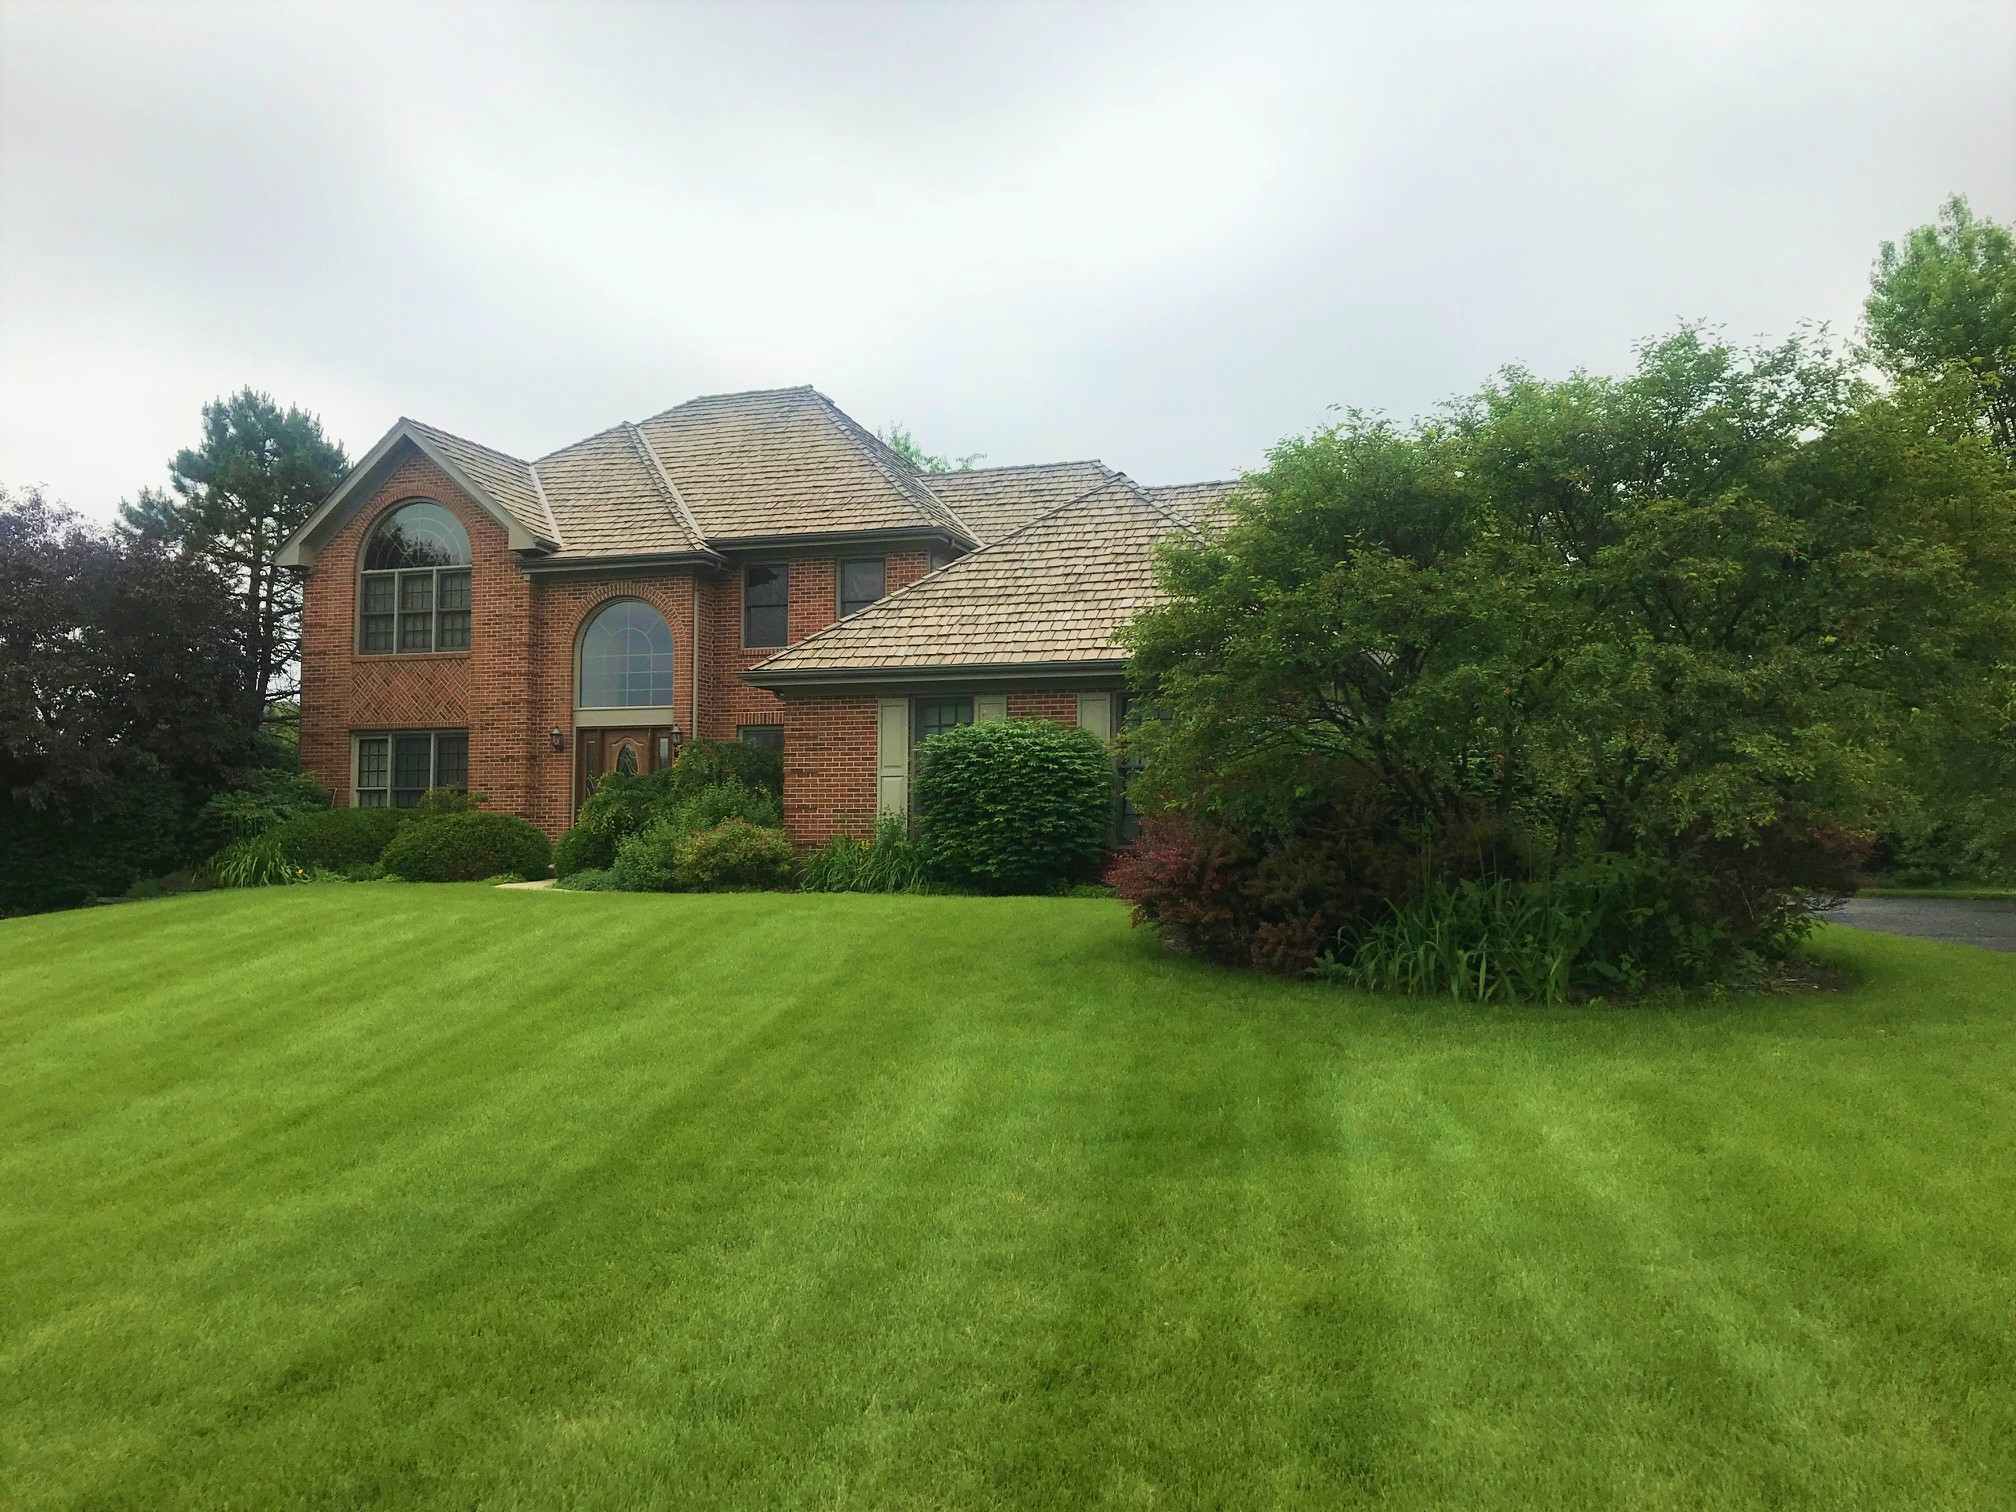 Photo of 6N125 E Ridgewood Dr , St Charles , IL , 60175